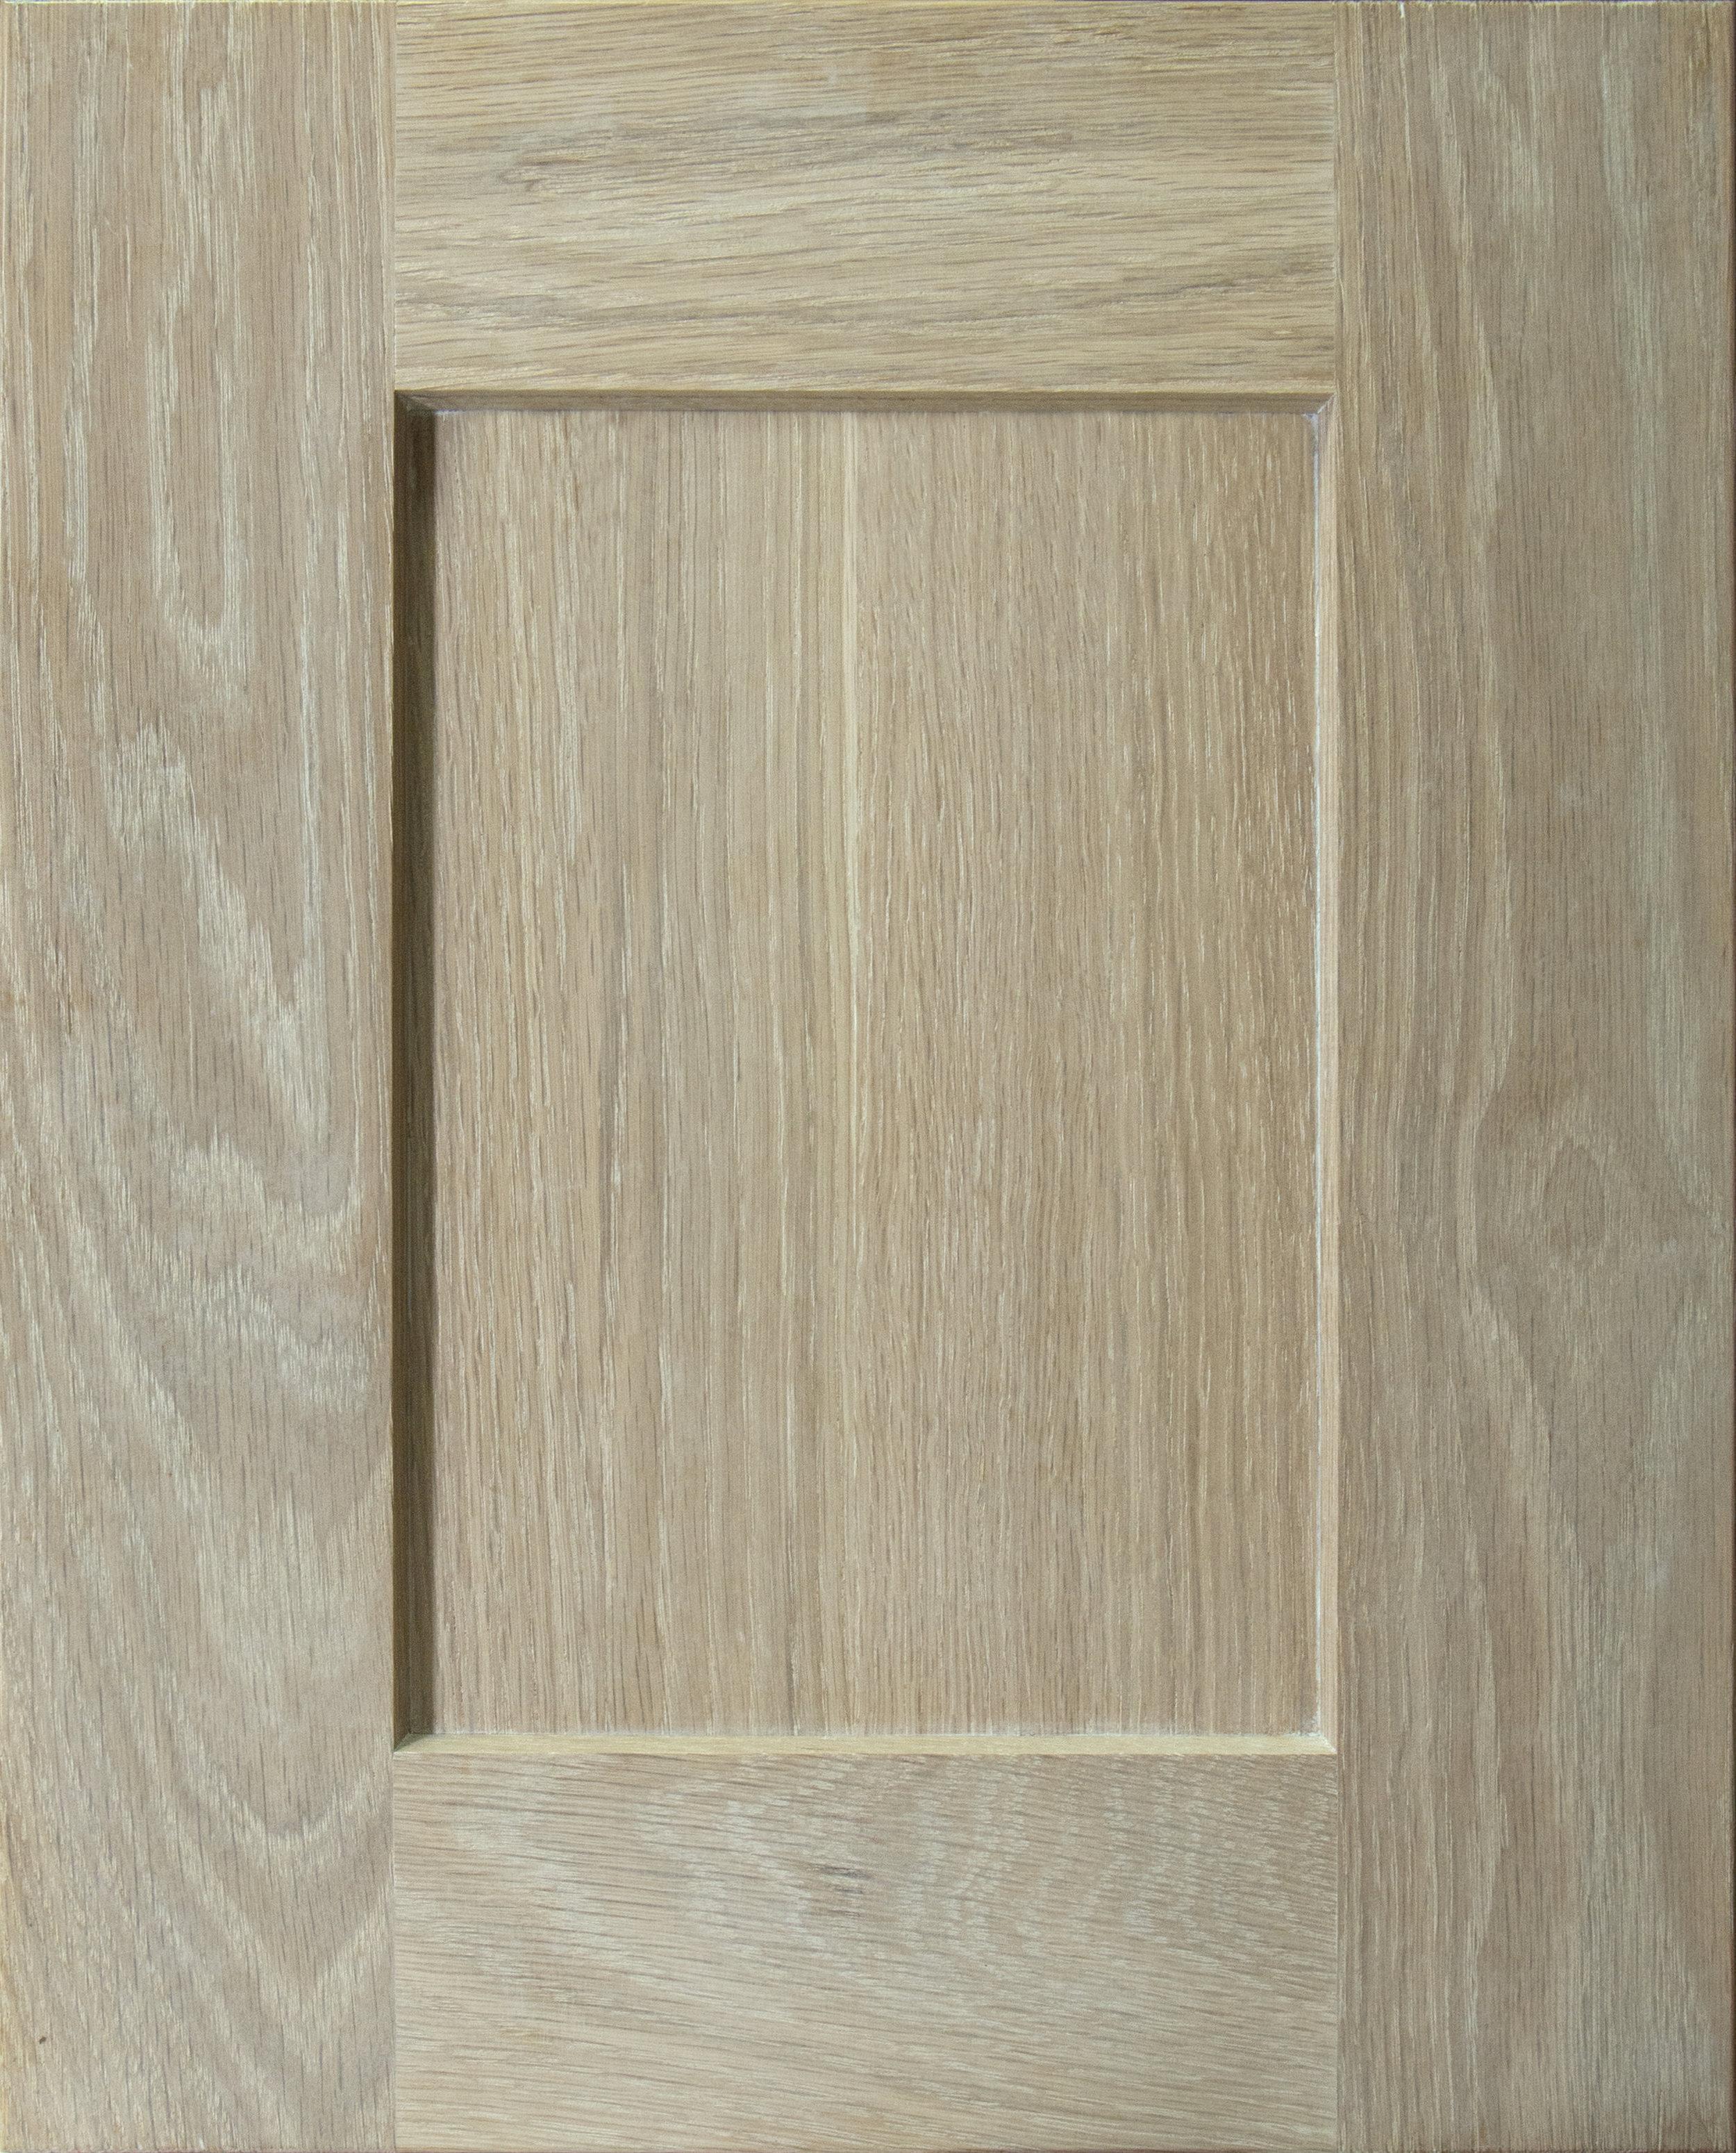 "Denali - Recessed 1/4"" Center PanelCherry | Maple | Paint | Rustic Beech | White OakShown in White Oak Sand"